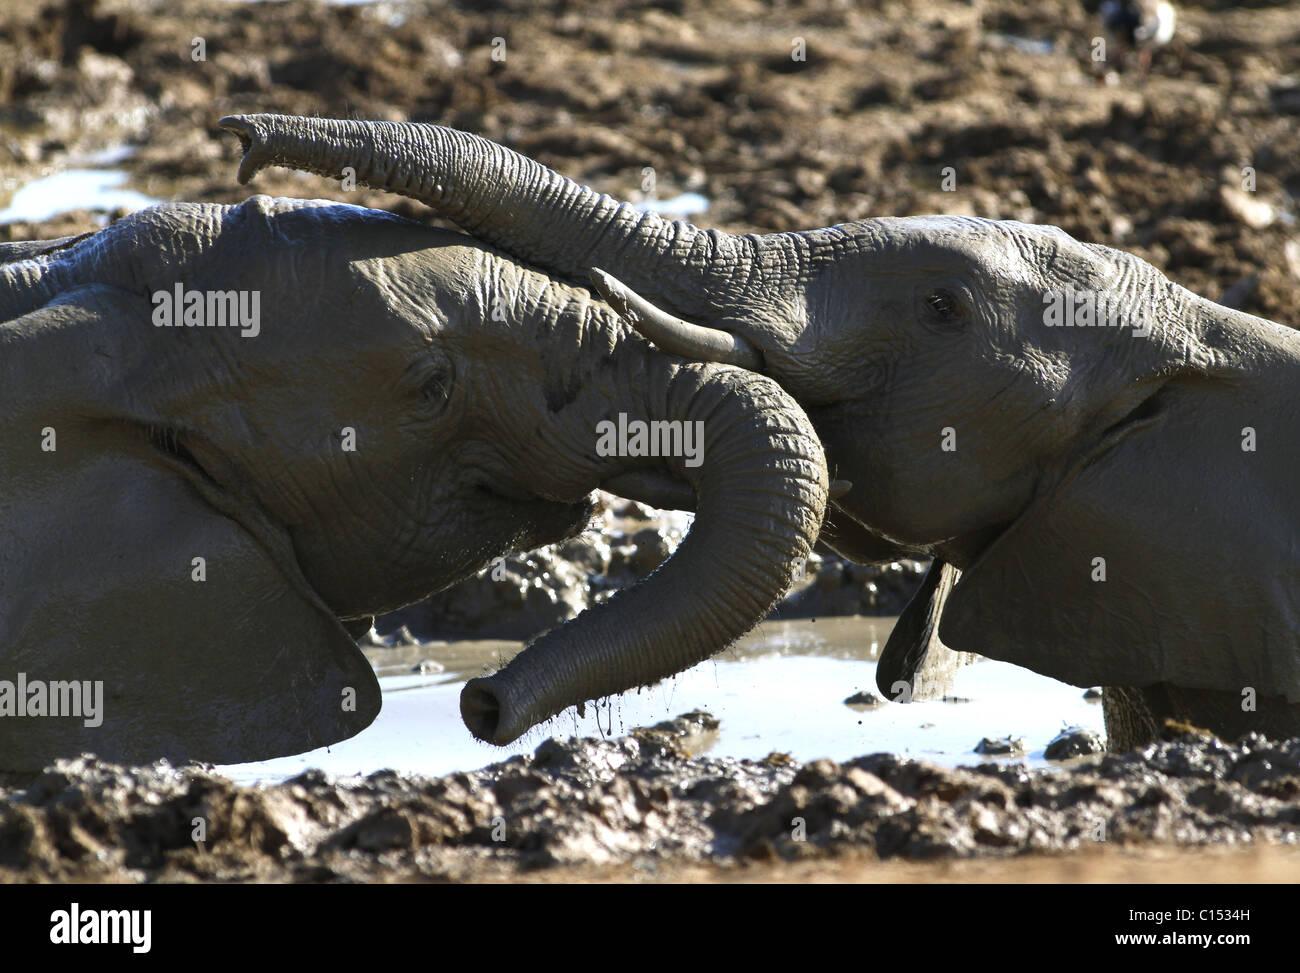 GREY afrikanischen Elefanten ADDO Südafrika ADDO NATIONAL PARK EASTERN CAPE in Südafrika ADDO ELEPHANT Stockbild